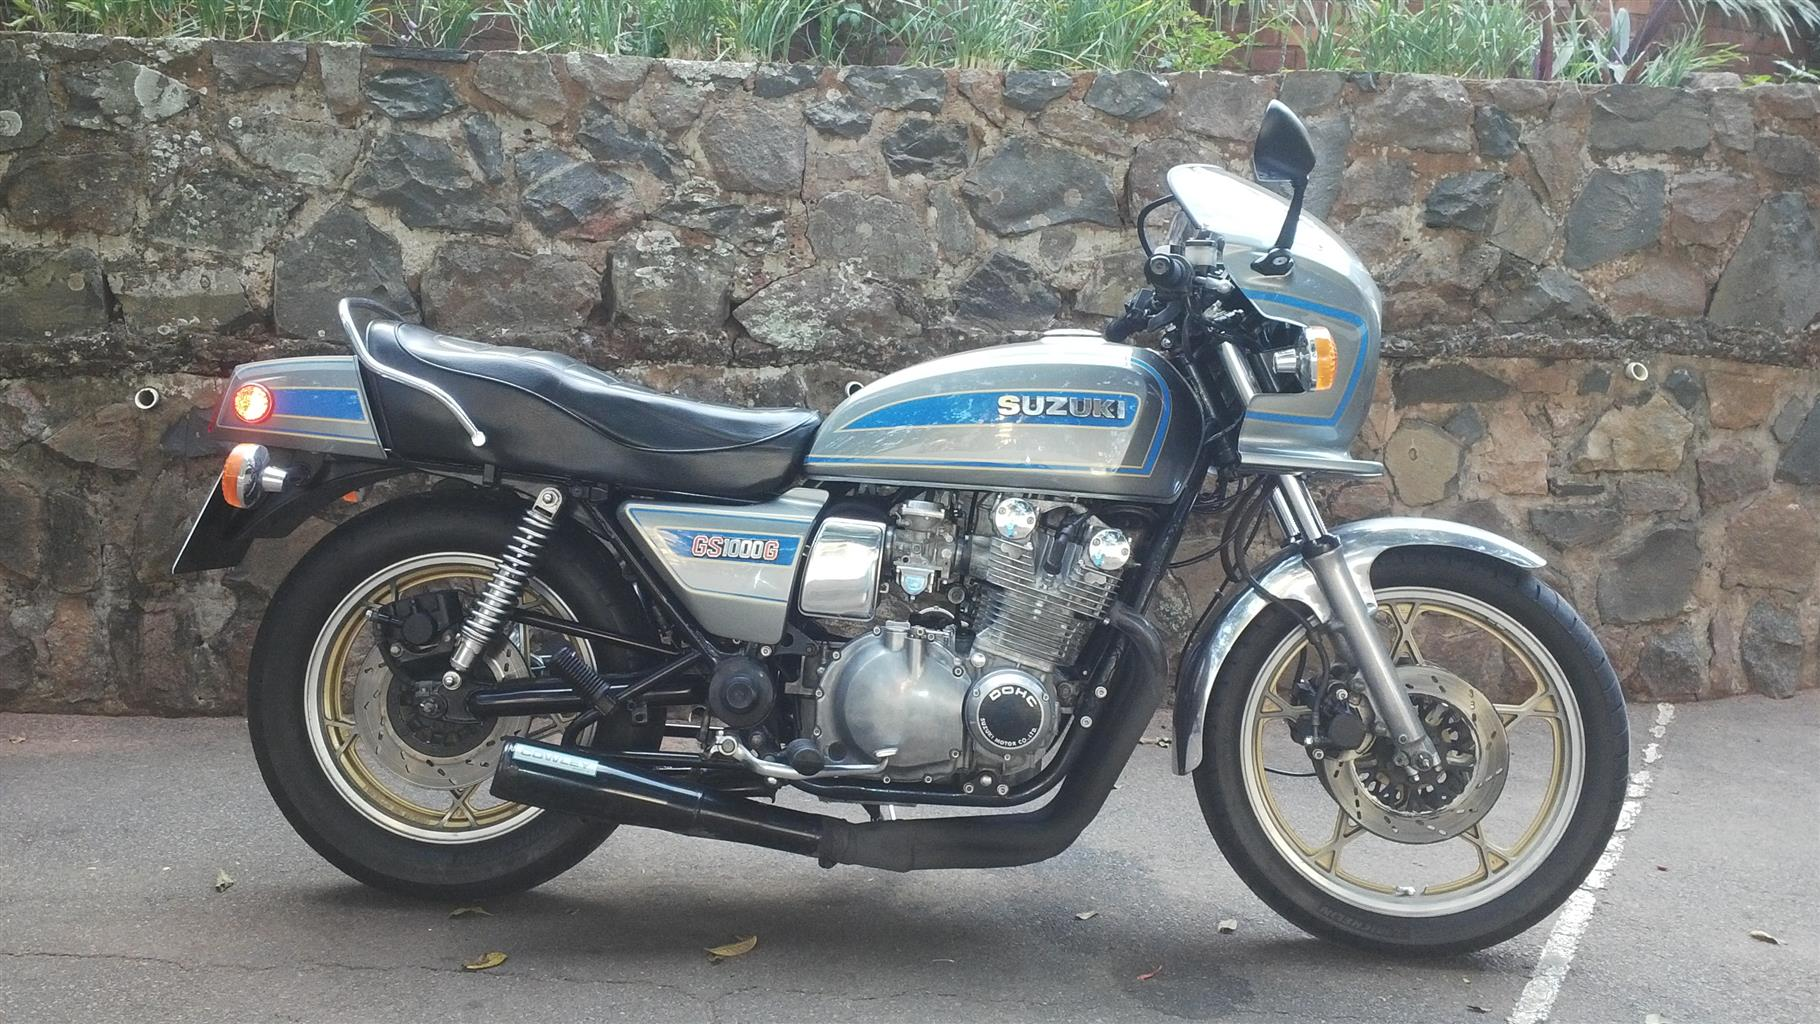 War Eagle Racing Motorcycle Screens and Fairings Suzuki GS1000S Standard Screen